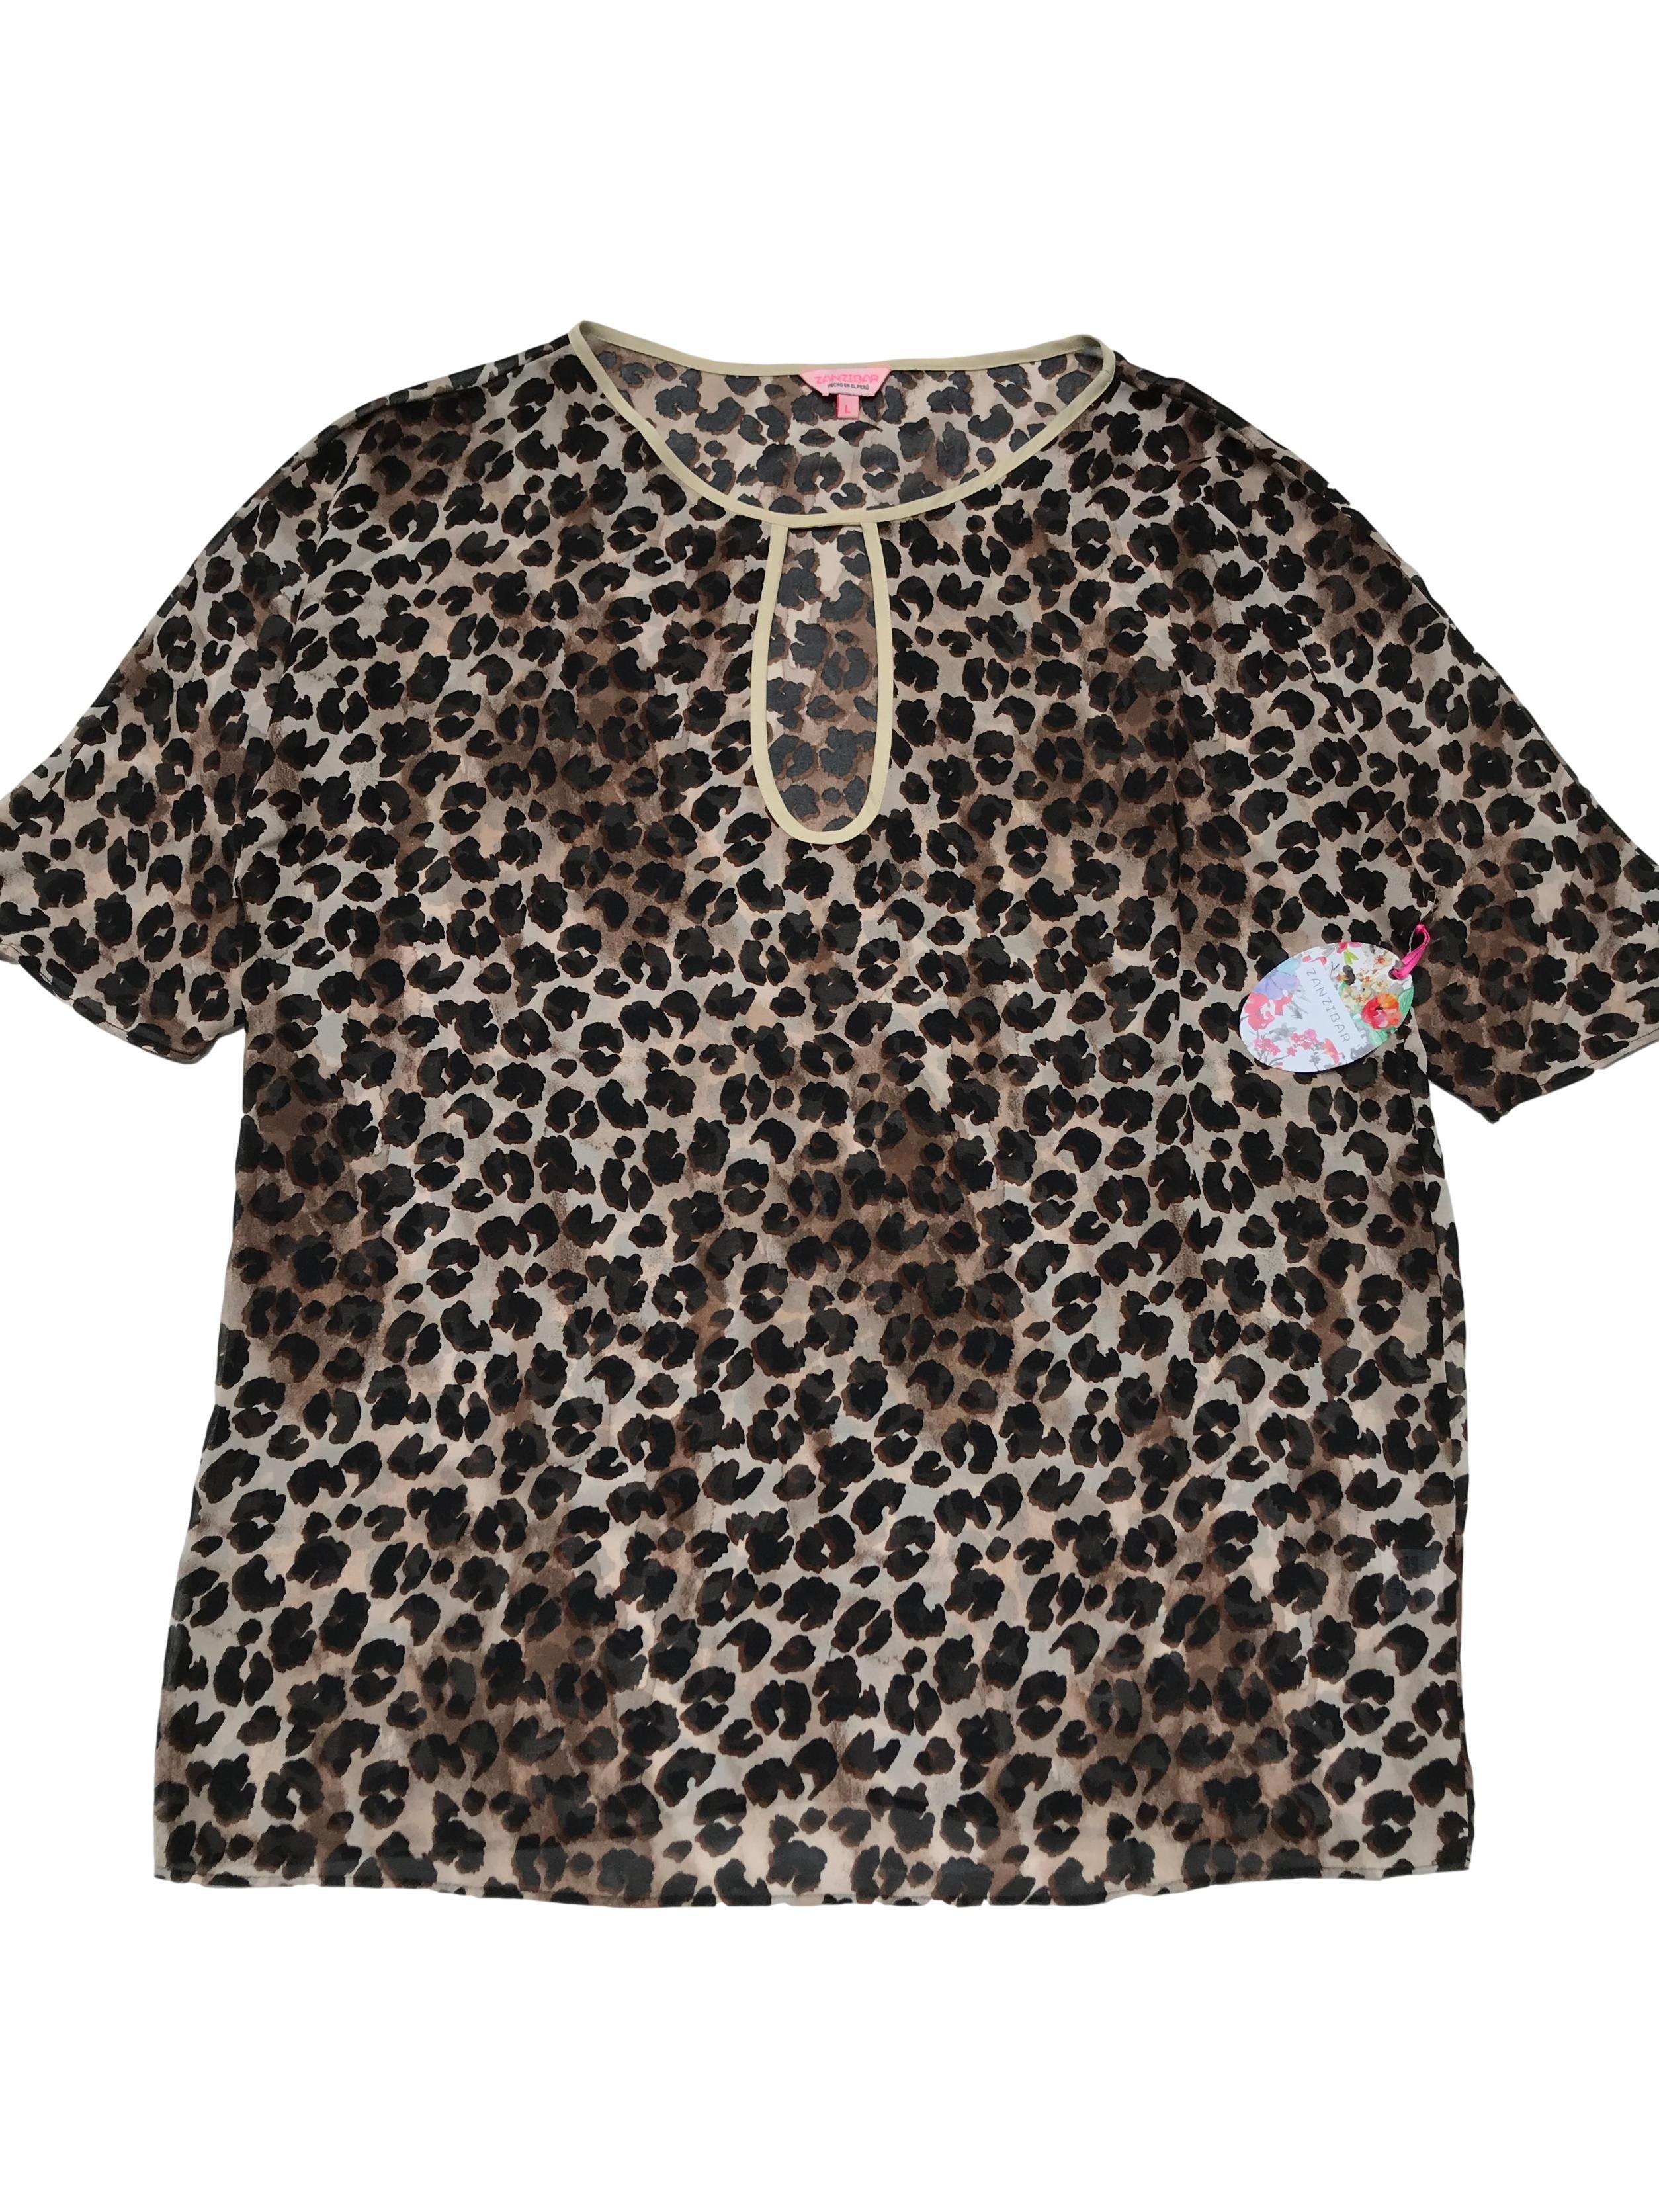 Blusa oversize Zanzibar de gasa animal print, oversize con escote de gota en el cuello. Largo 75cm. Nueva con etiqueta.